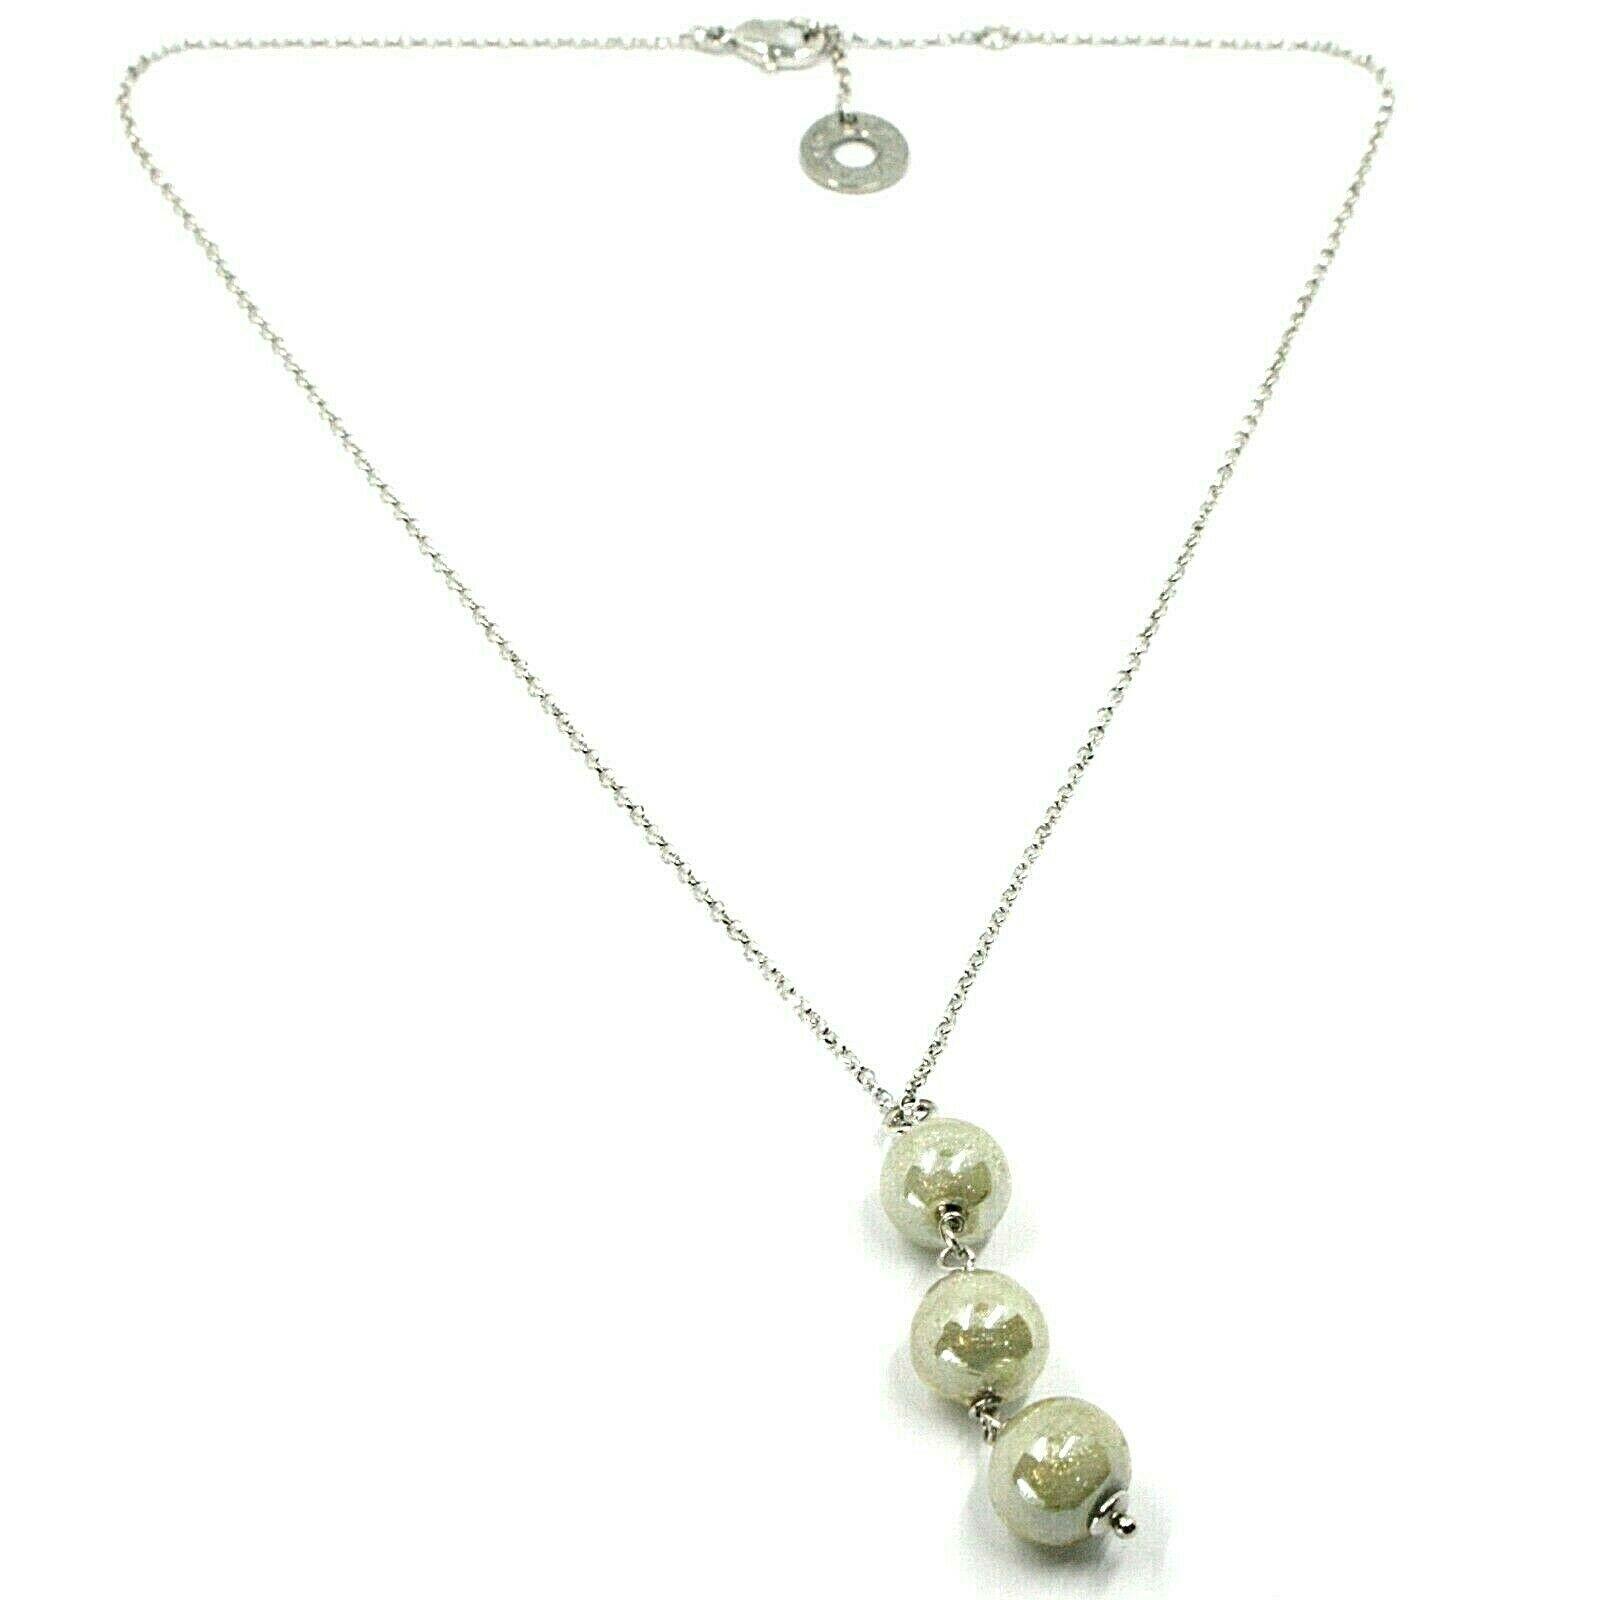 Necklace Antica Murrina Venezia, COA02A02, Spheres Grey Hanging, Chain Rolo '